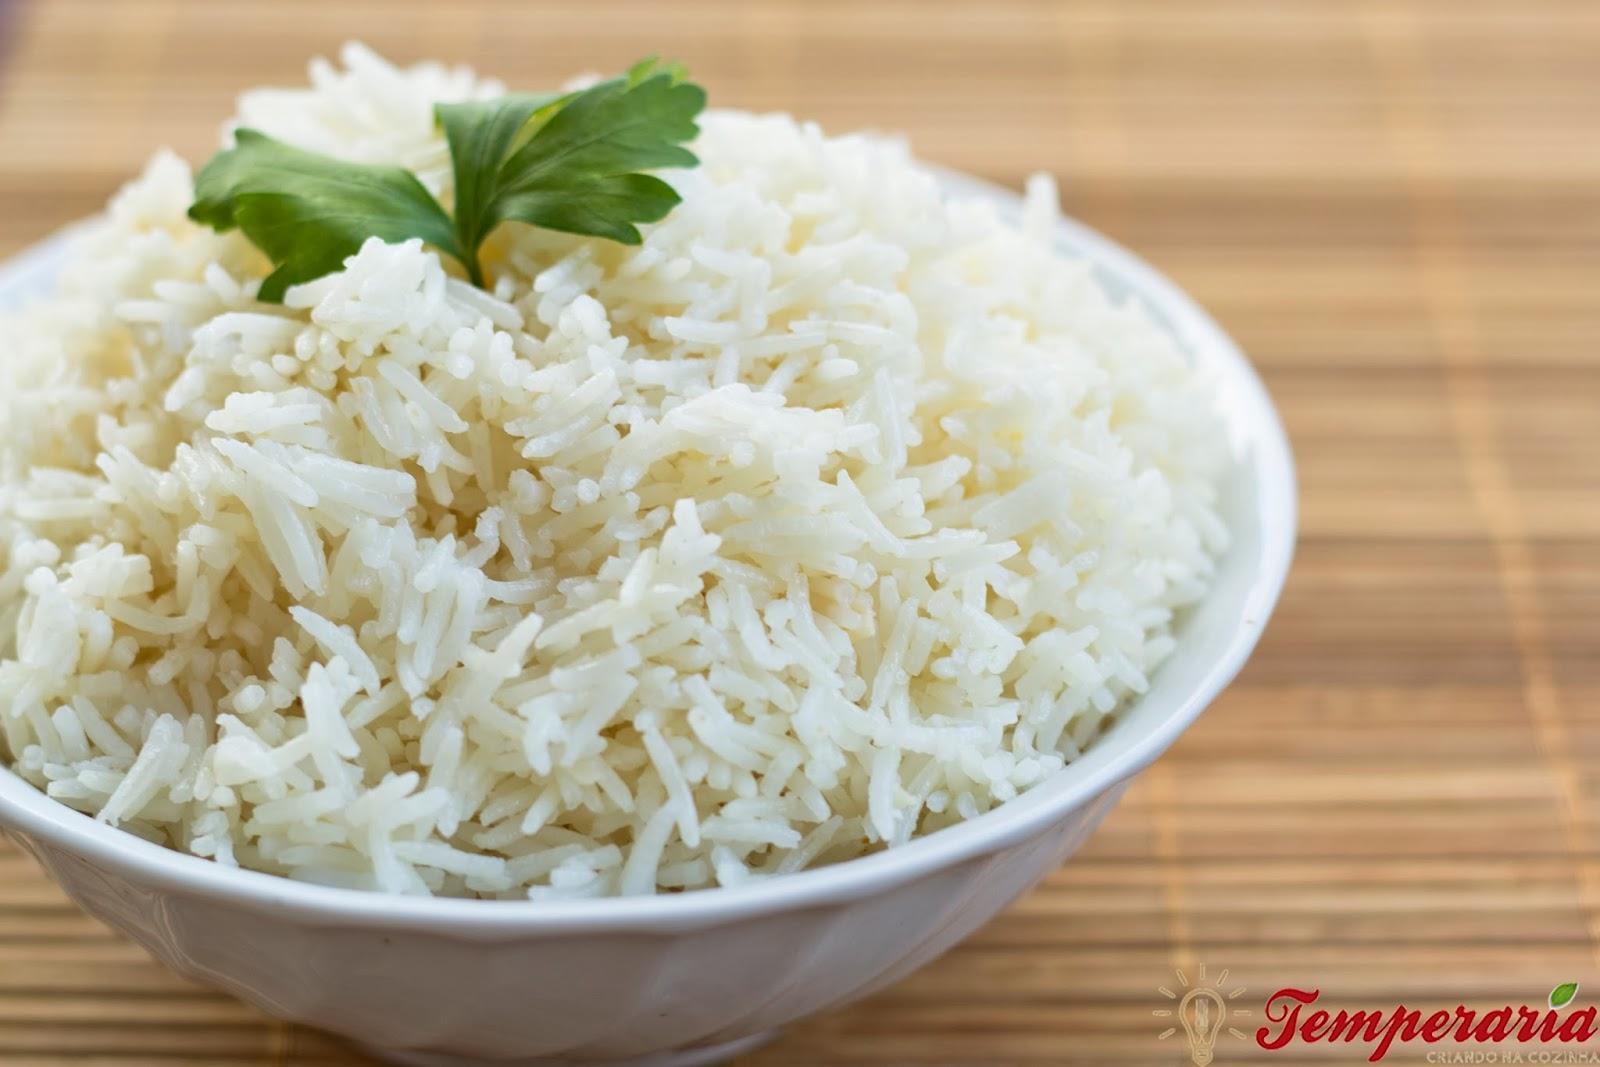 Est tica e beleza os 5 tipos de arroz c seus benef cios for Cocinar 6 tipos de arroz